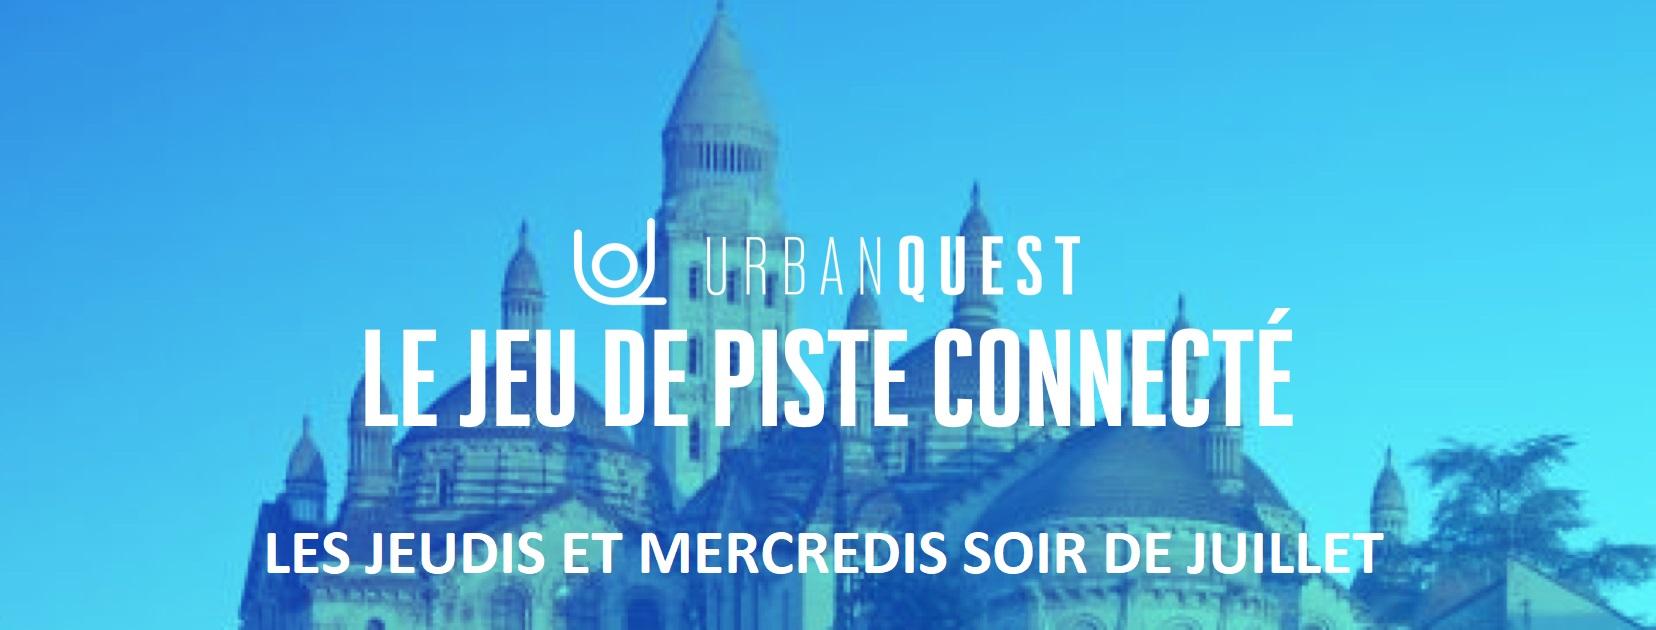 urbanquest-px-JUILLET